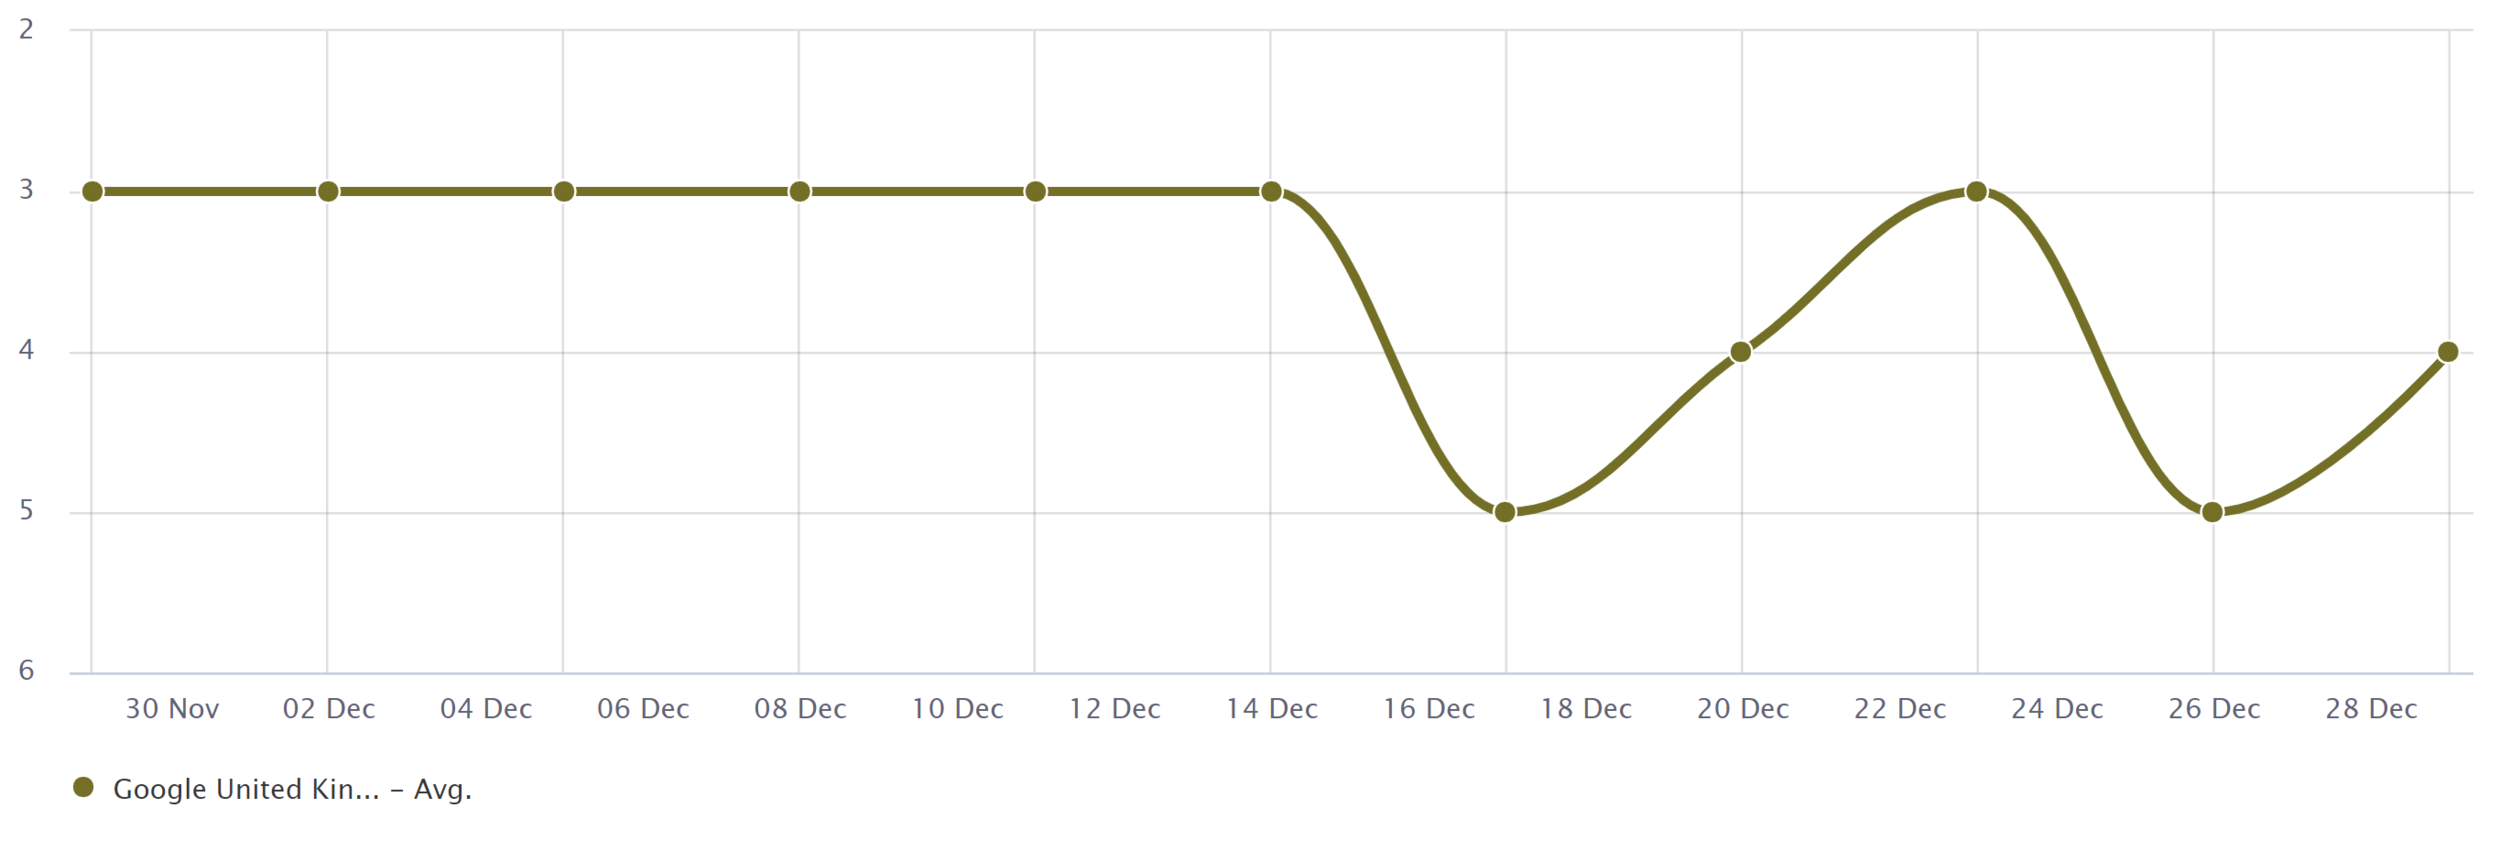 Cotswold Outdoor Average Google Position Dec 18